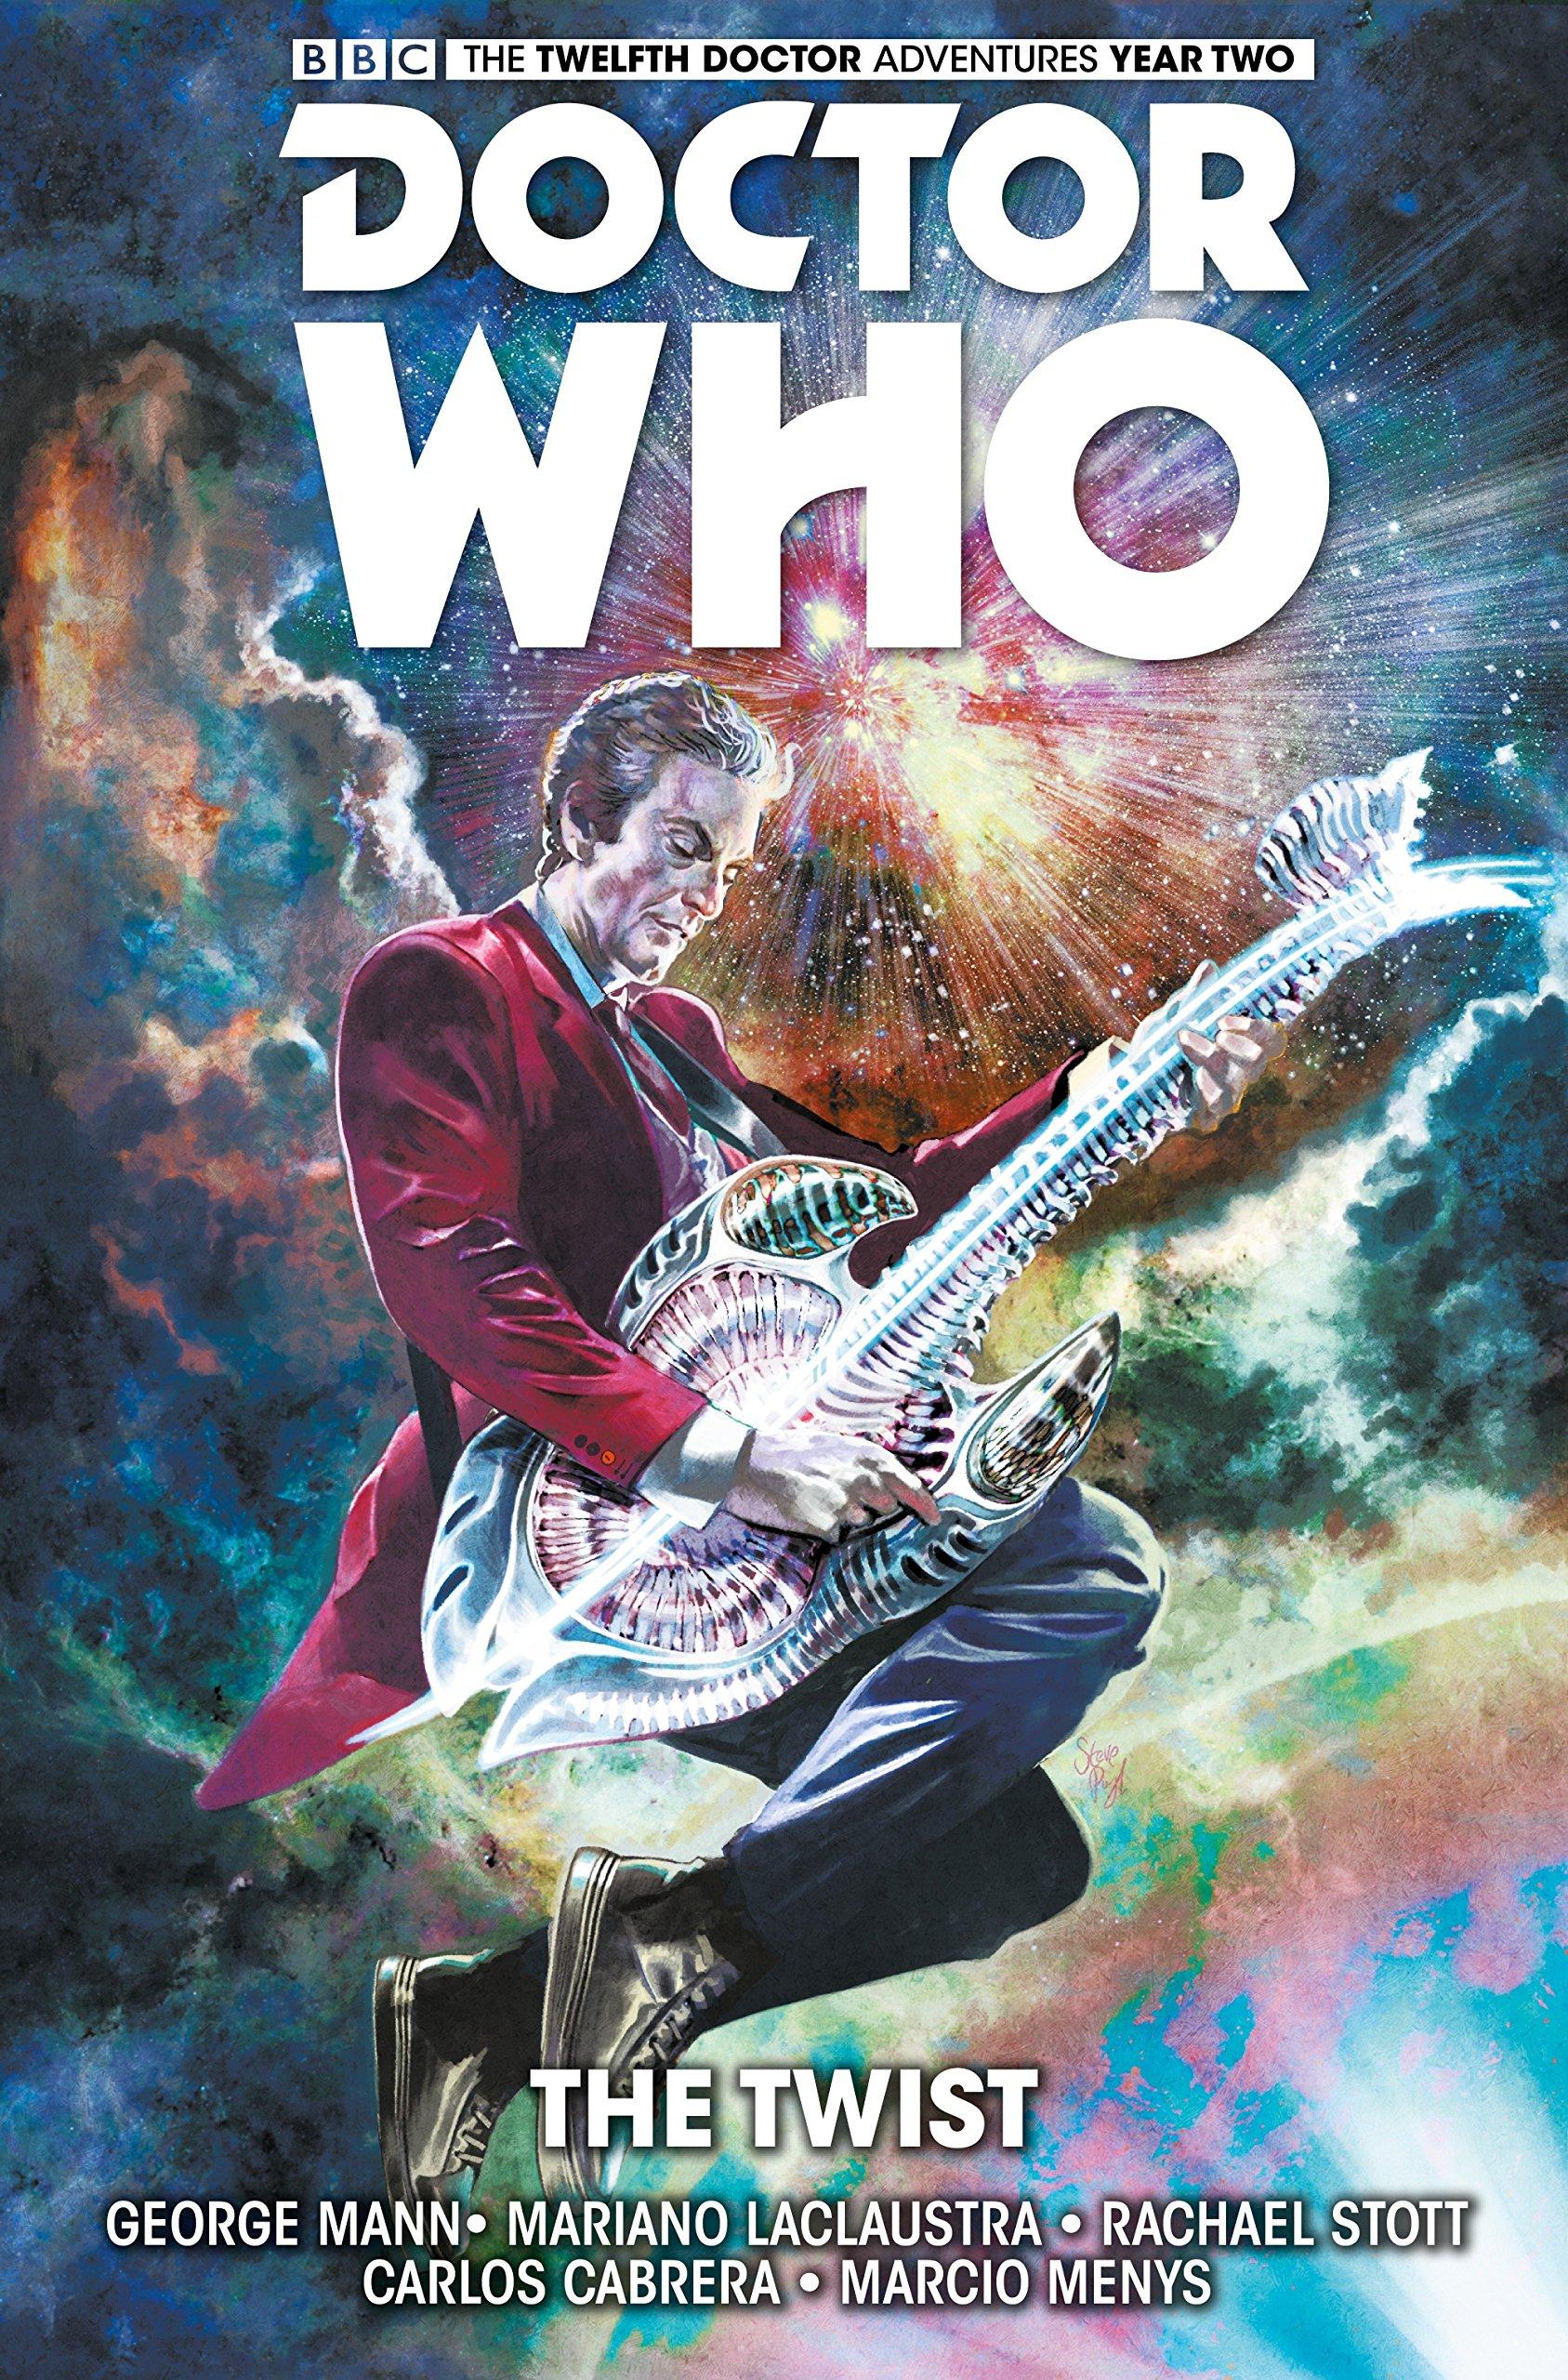 Doctor Who: The Twelfth Doctor Volume 5 - The Twist pdf epub